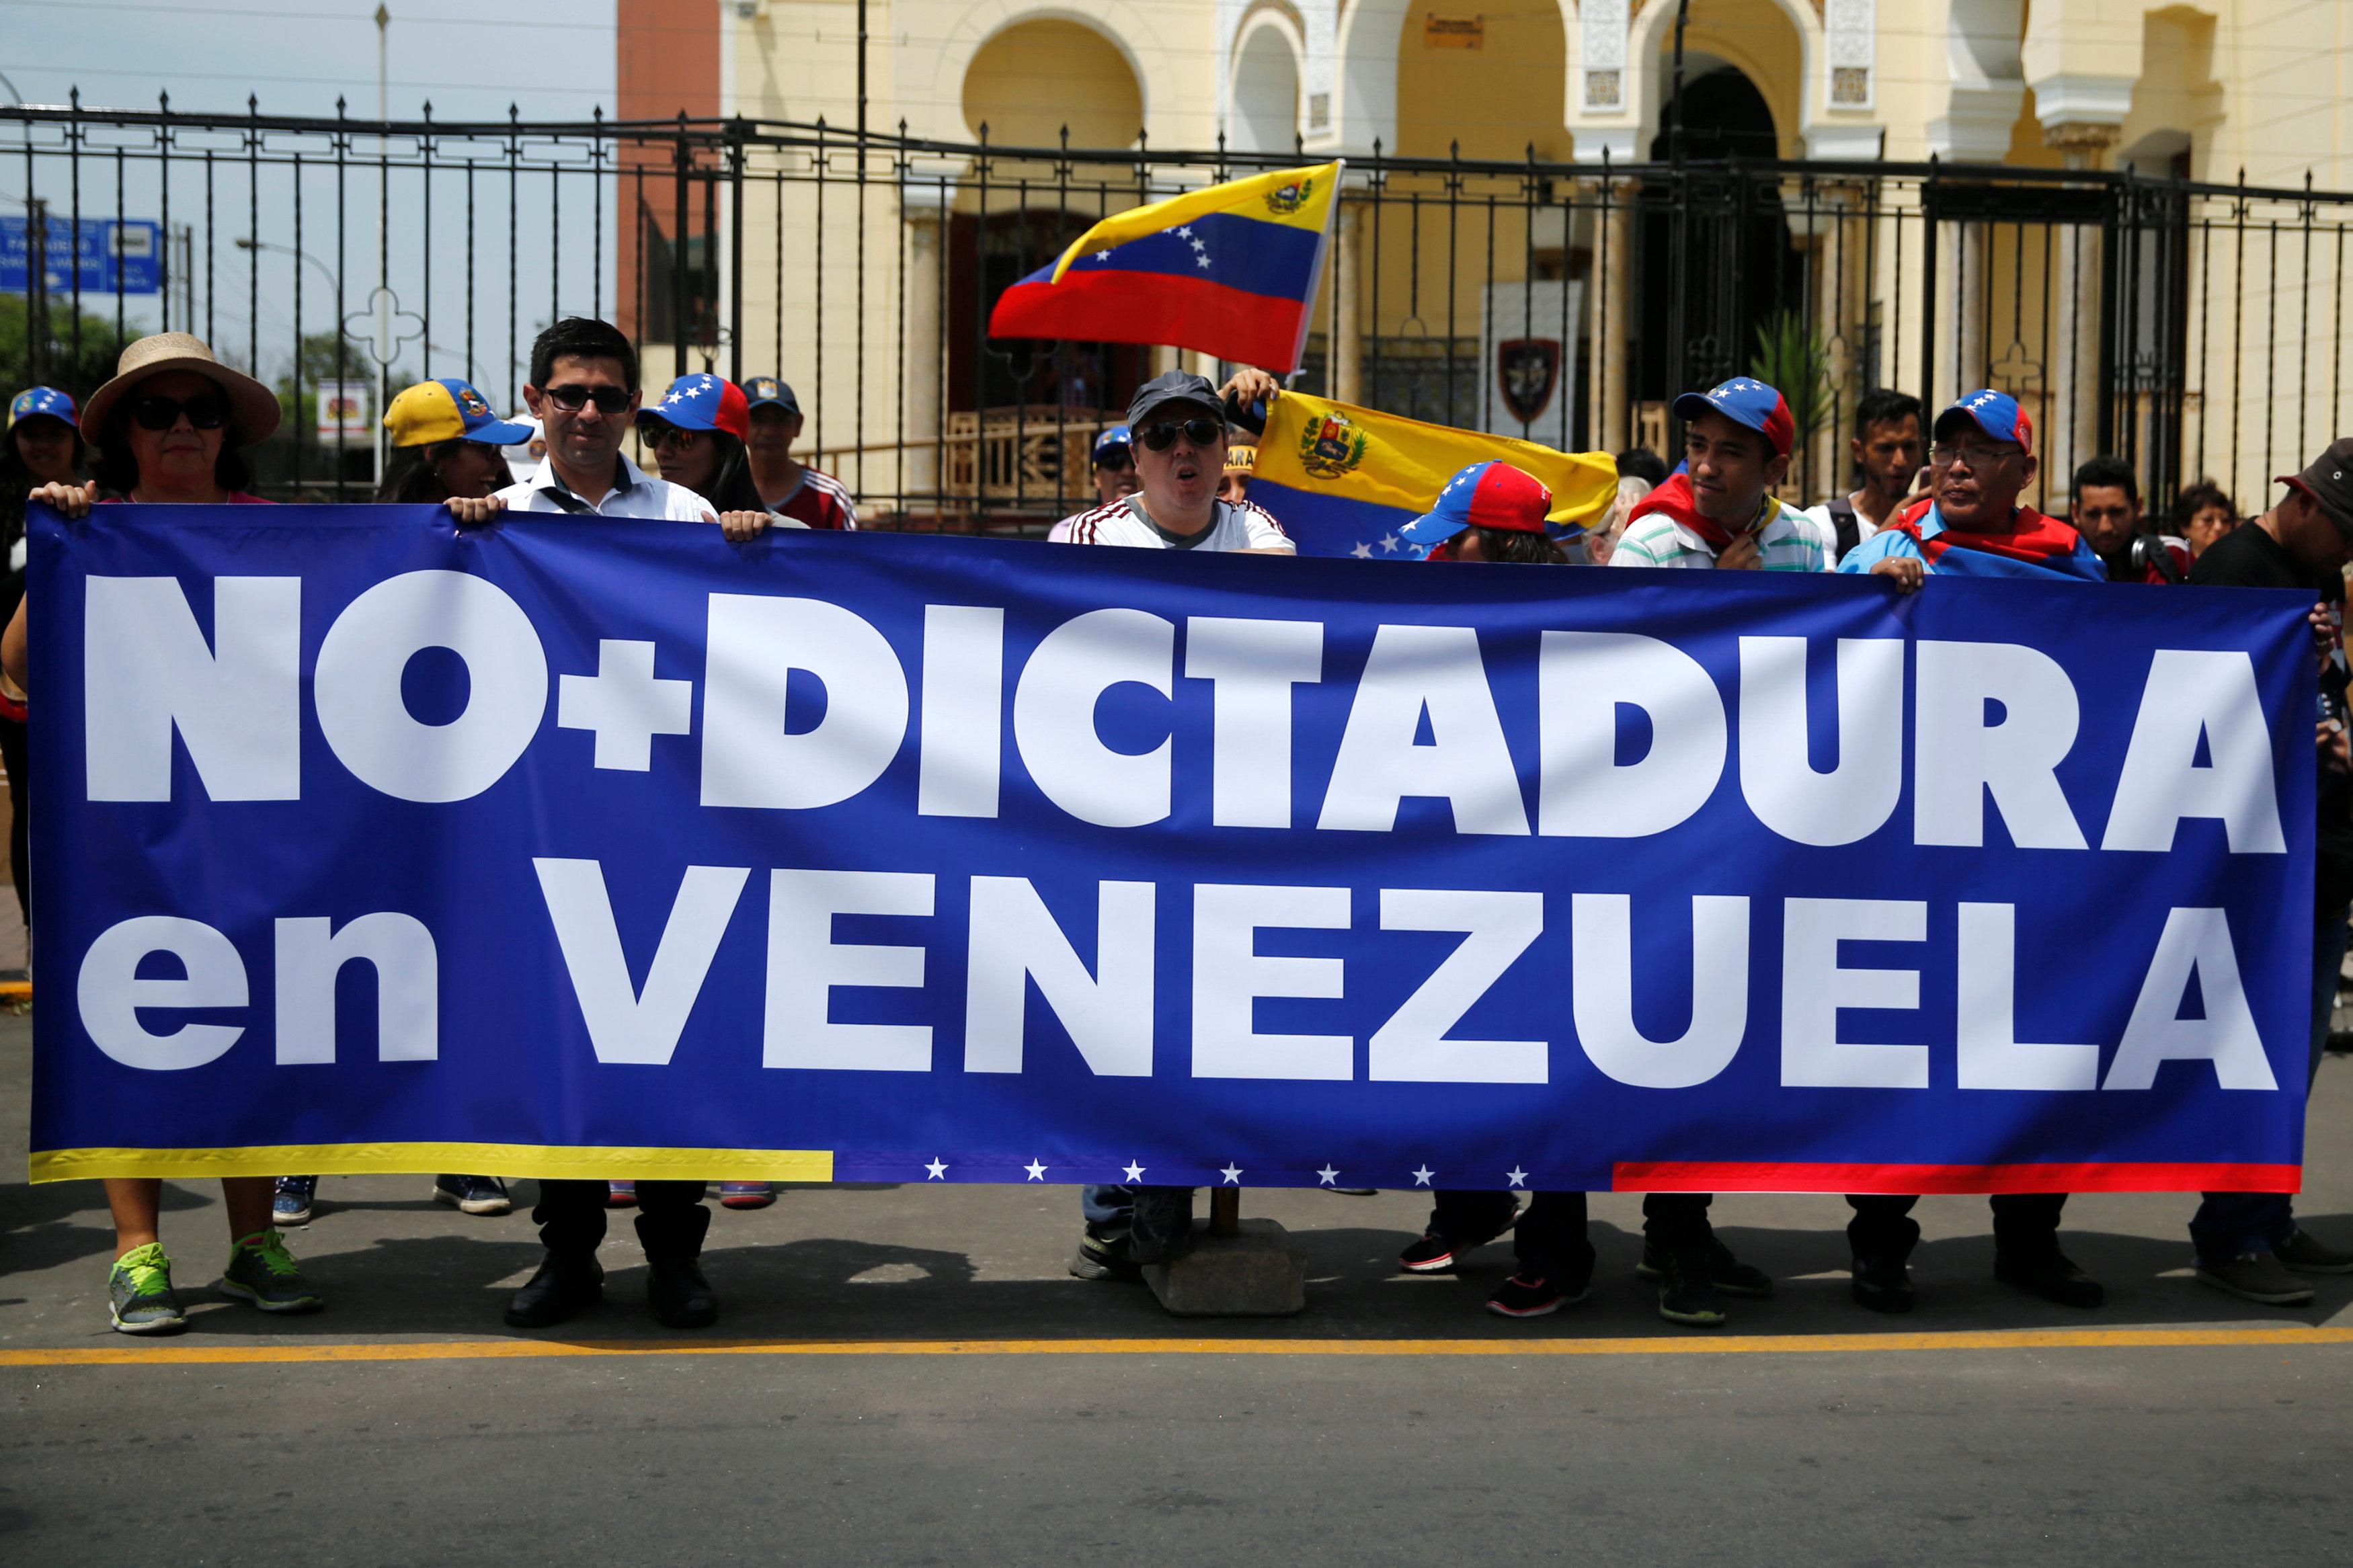 REUTERS / Guadalupe Pardo